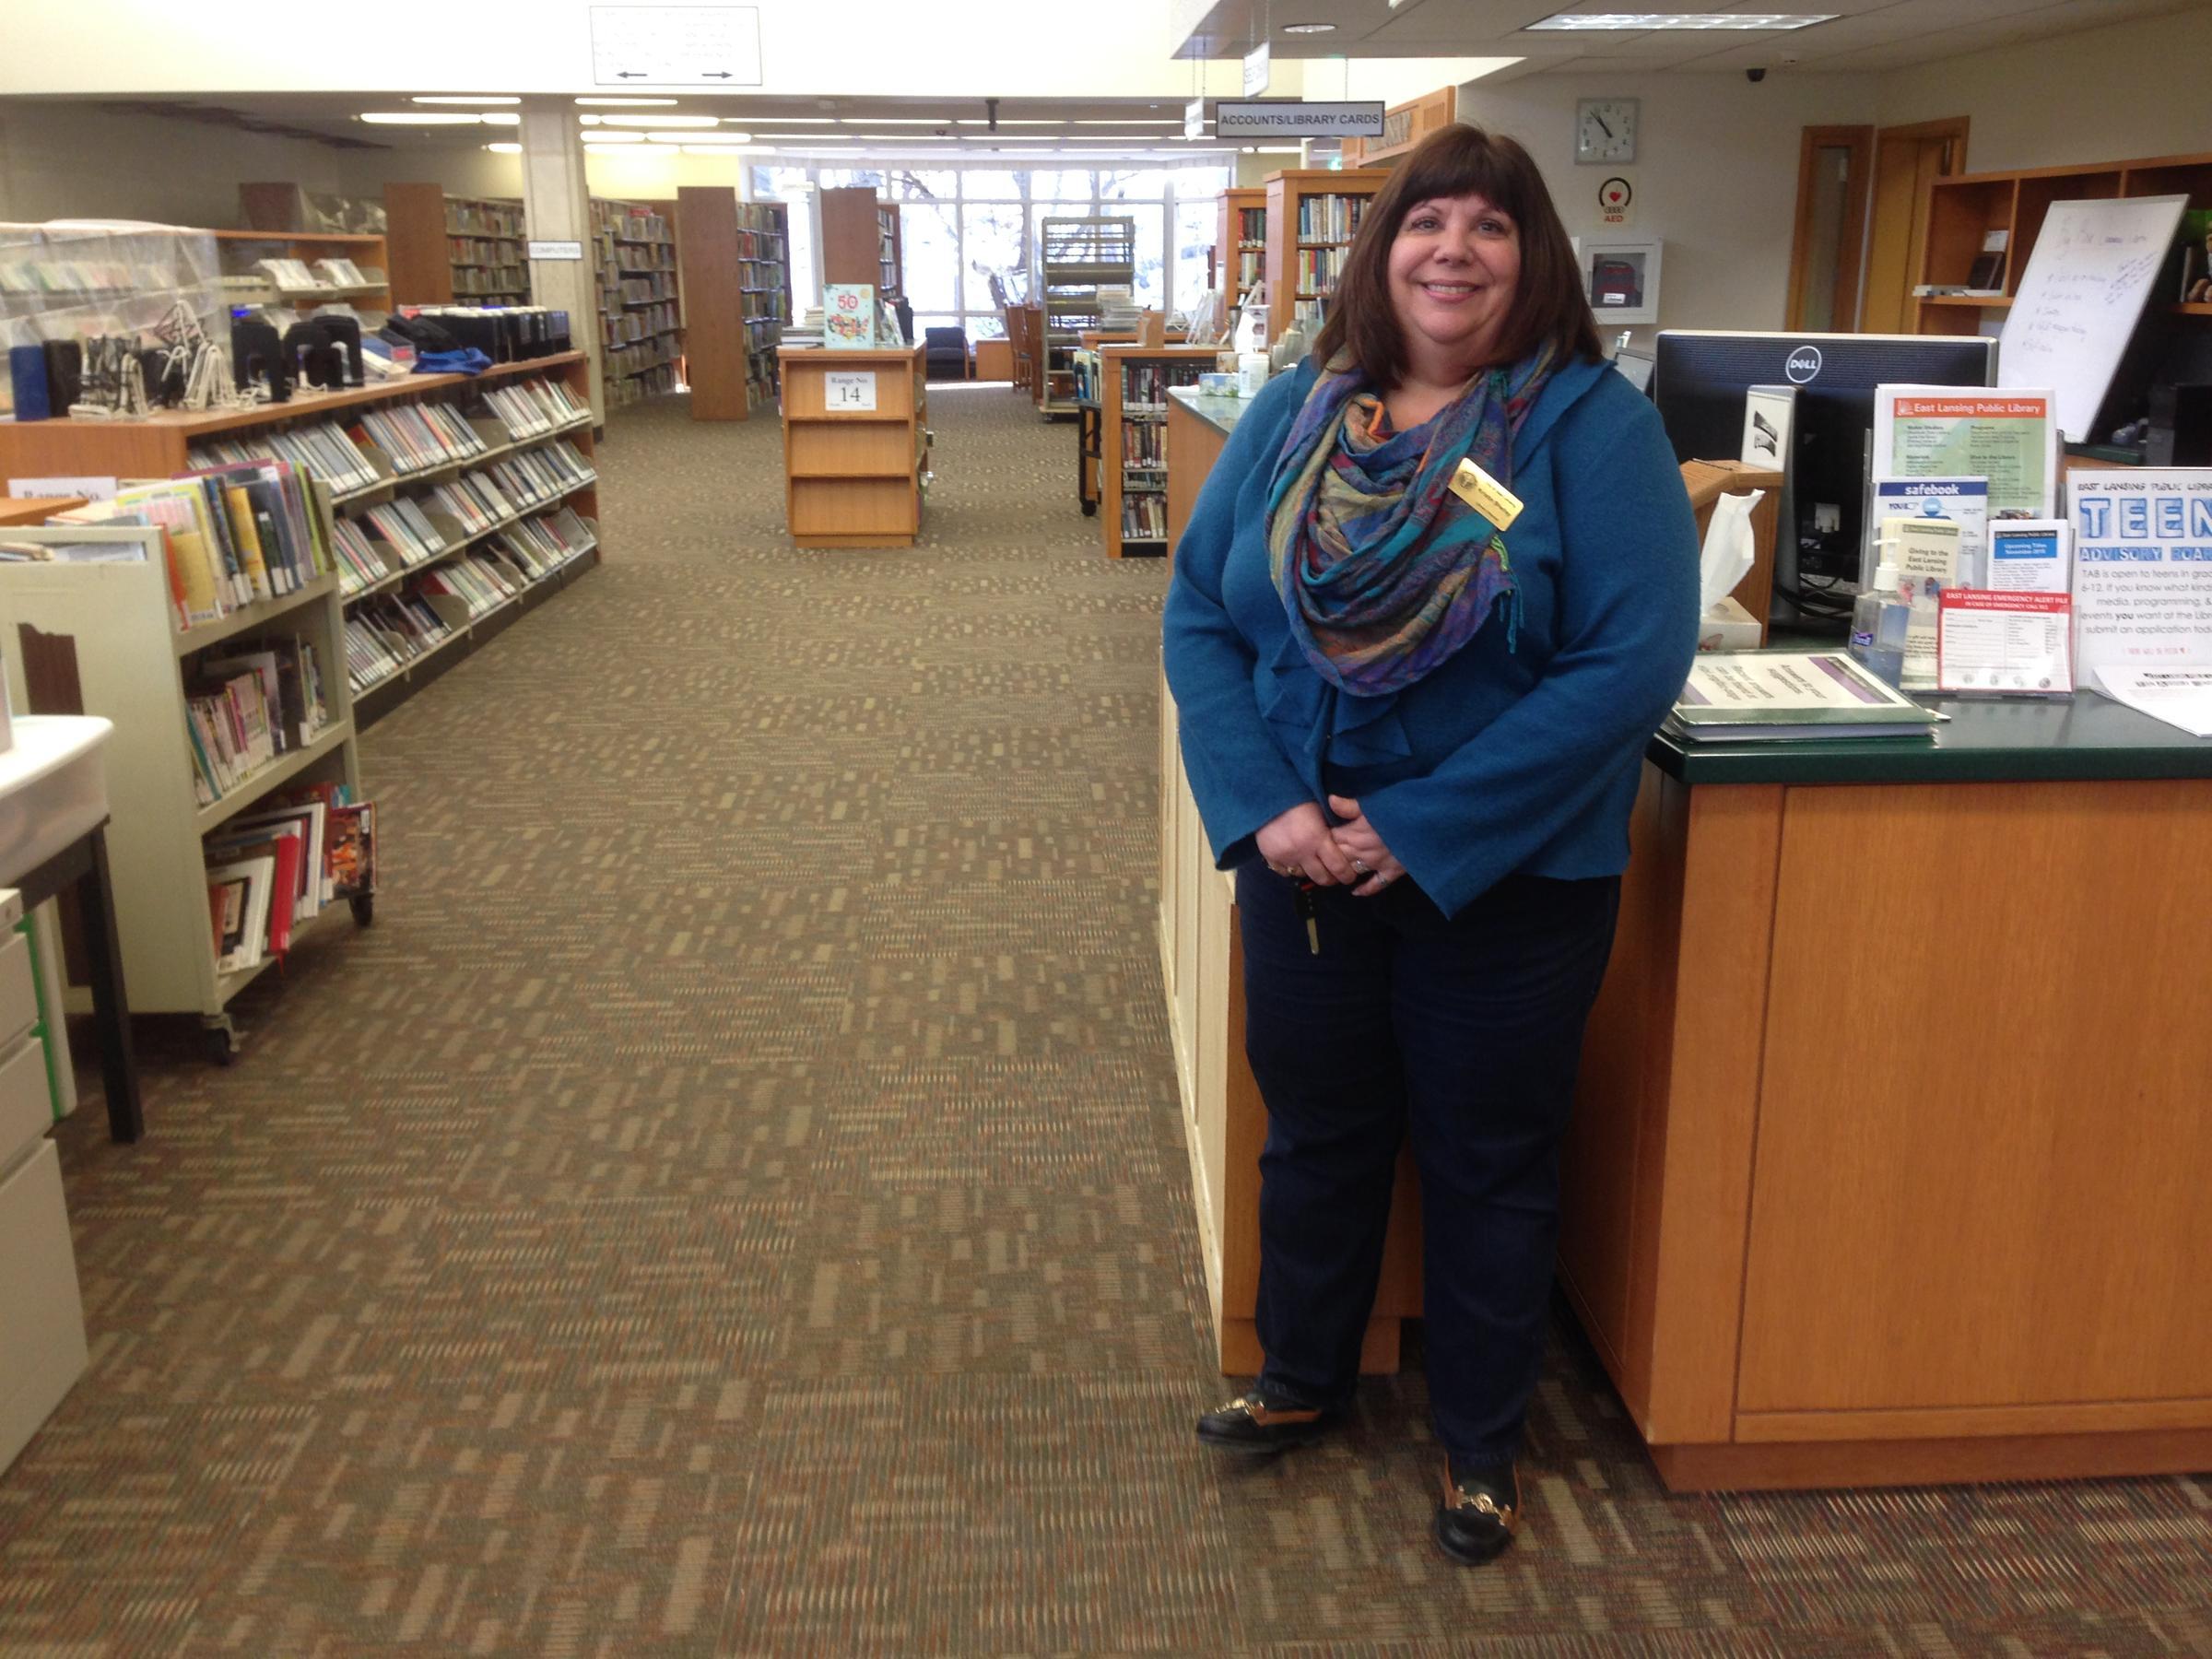 Pardon the dust EL public library opens door amidst